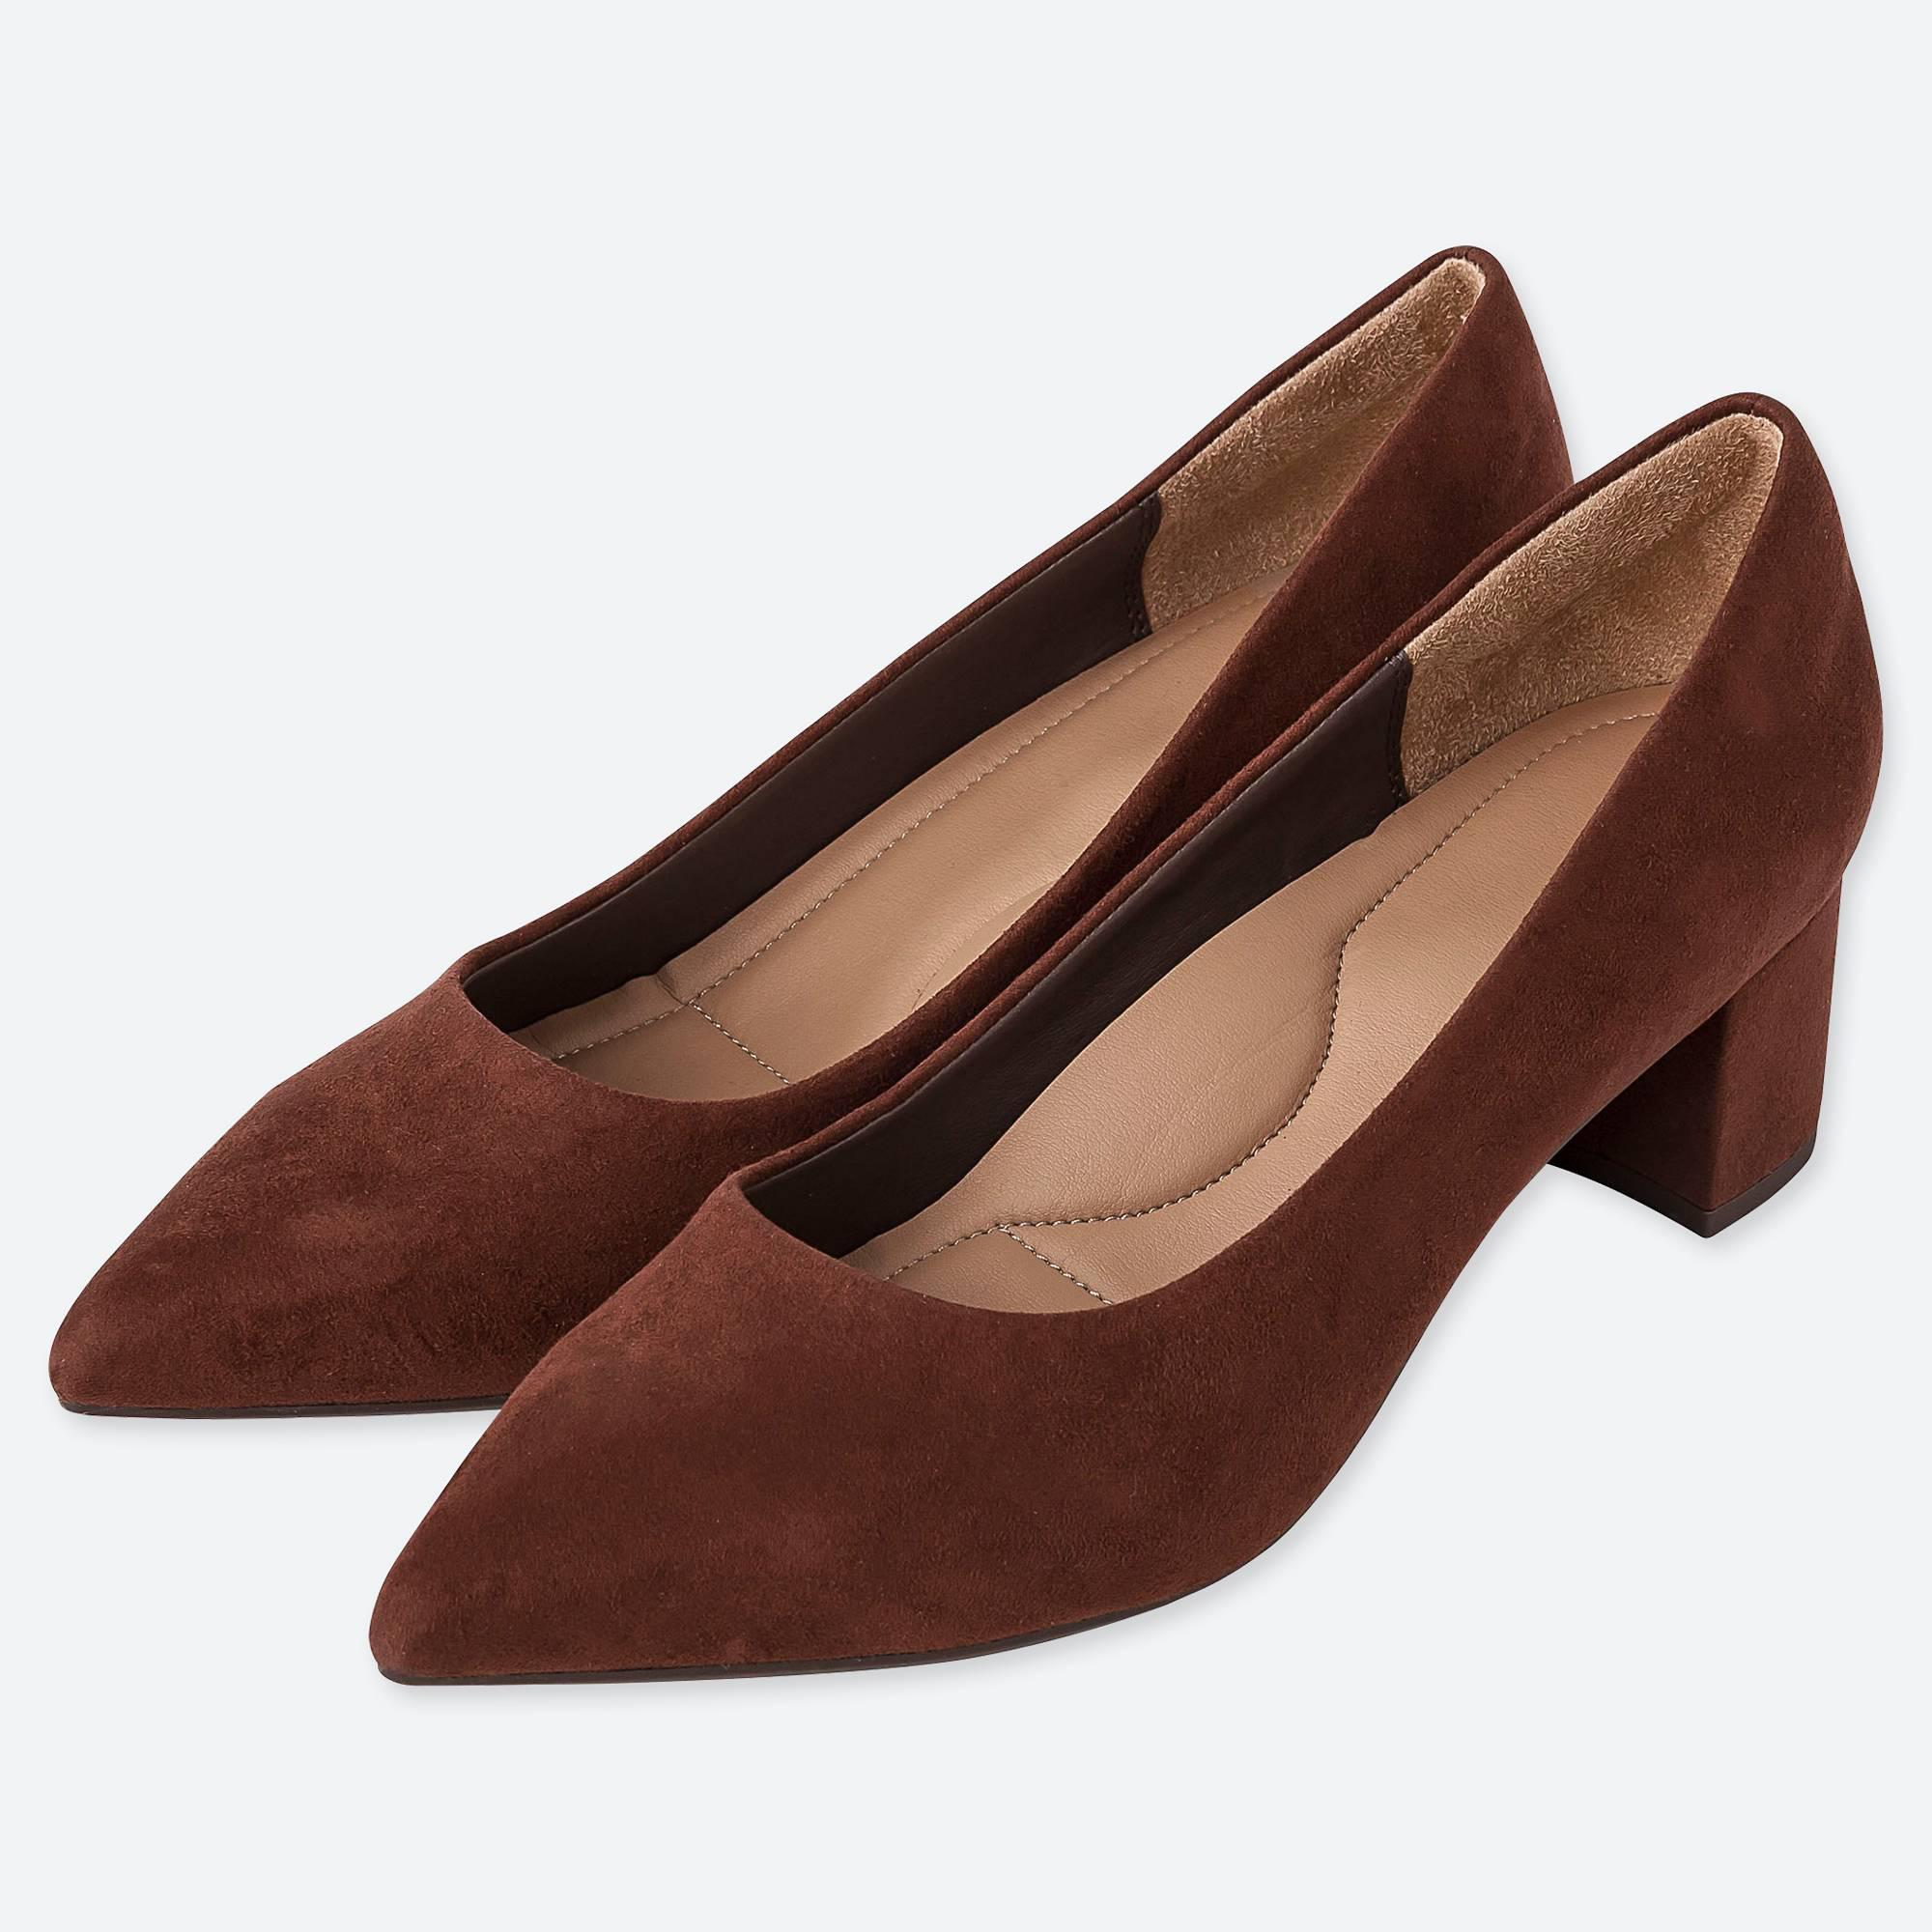 540dd31670b1 Uniqlo - Brown Women Chunky Heeled Shoes - Lyst. View fullscreen